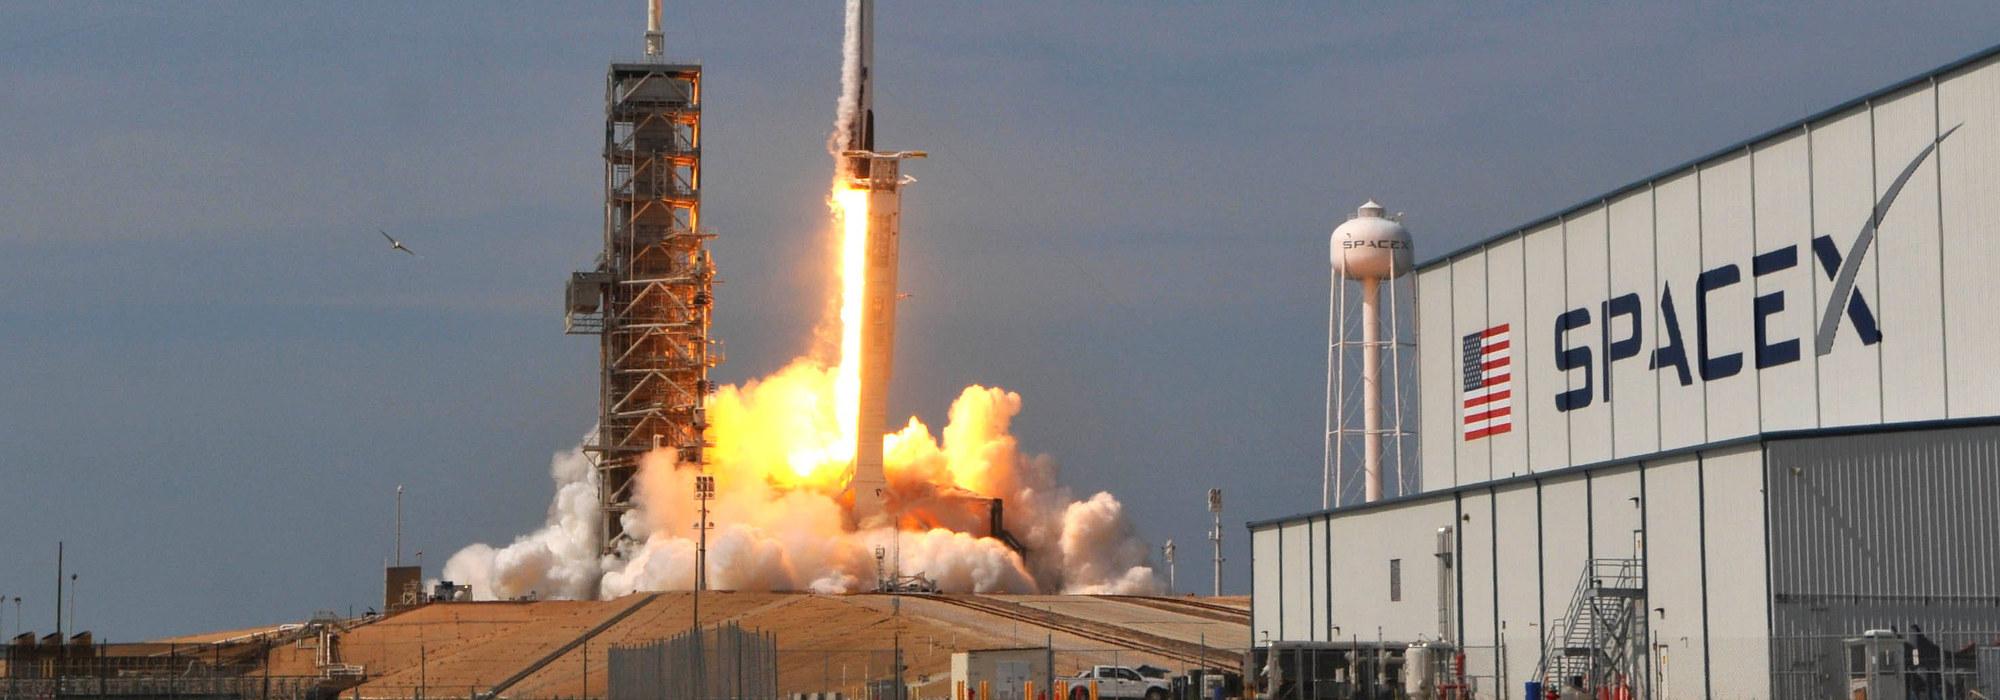 SpaceX: Bir Uzay Şirketinin Anatomisi